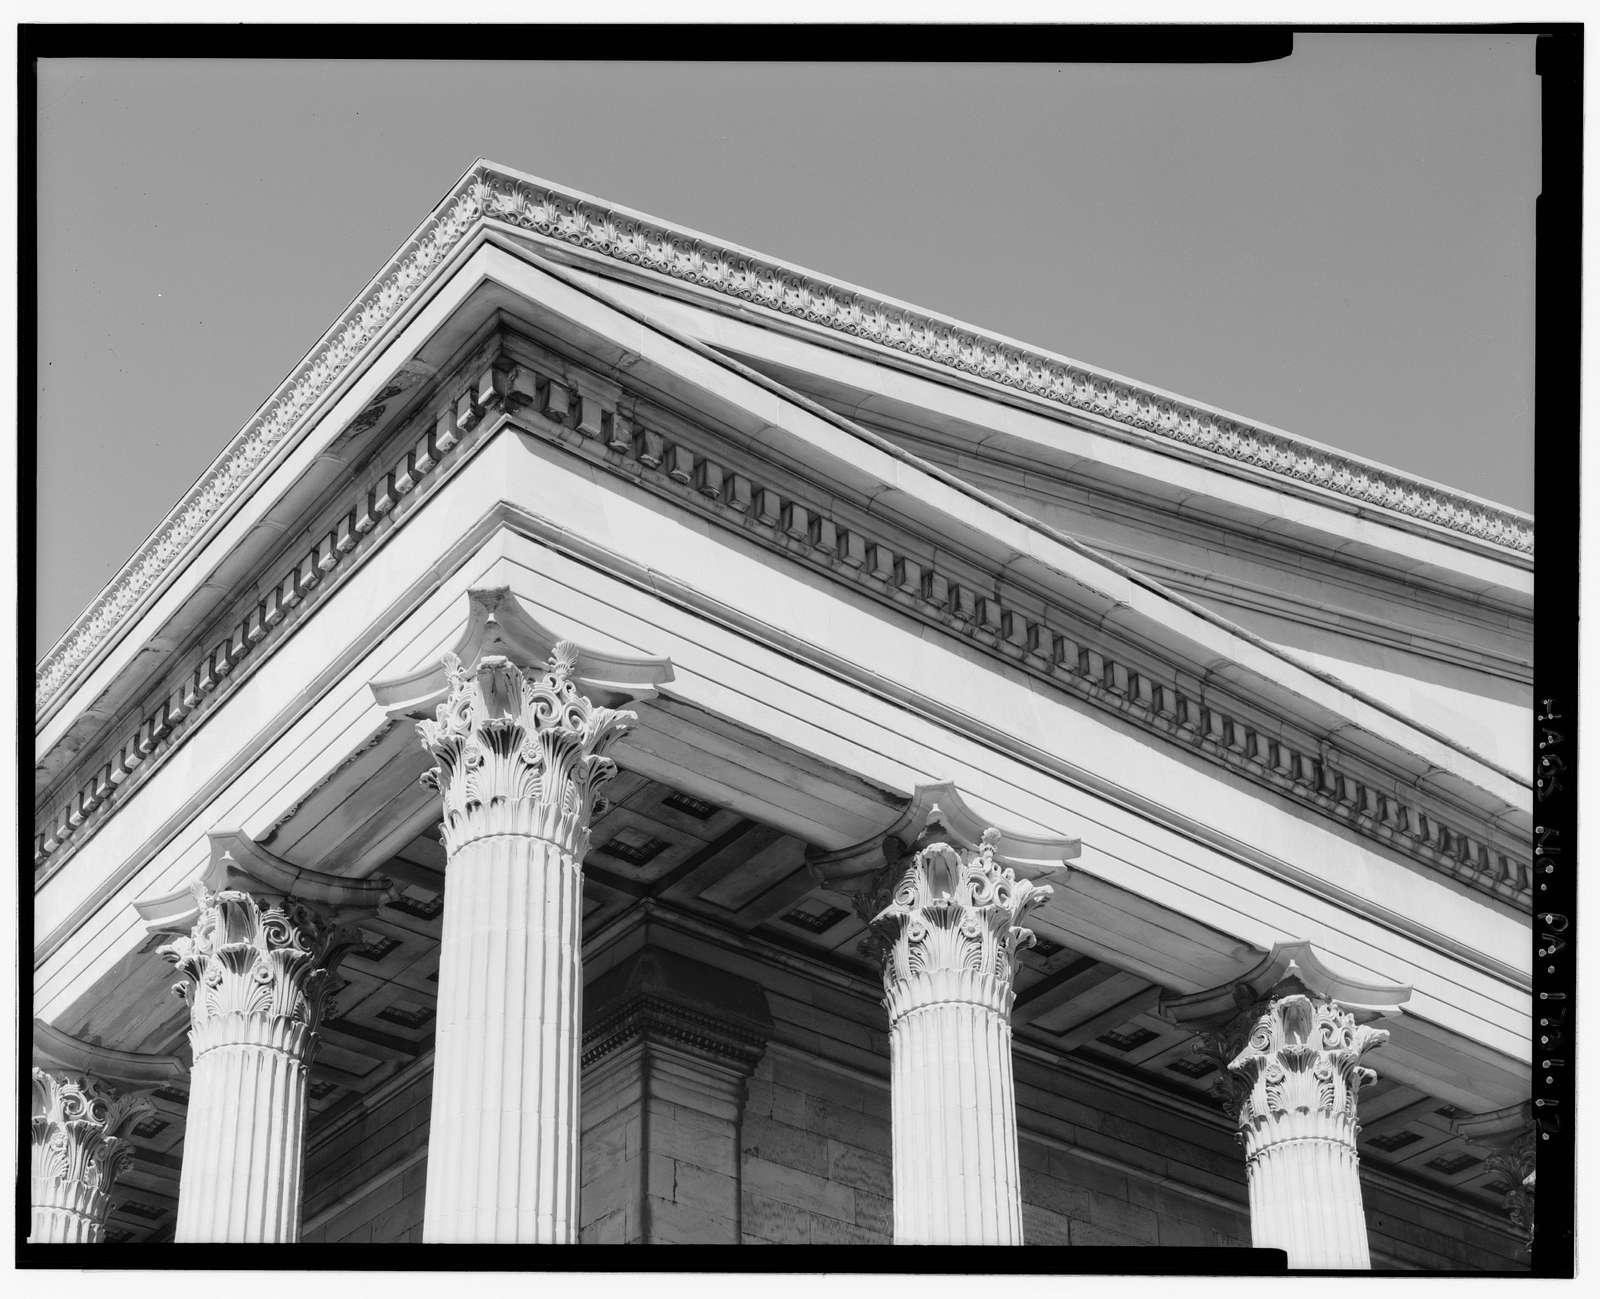 Girard College, Founder's Hall, Girard & Corinthian Avenues, Philadelphia, Philadelphia County, PA